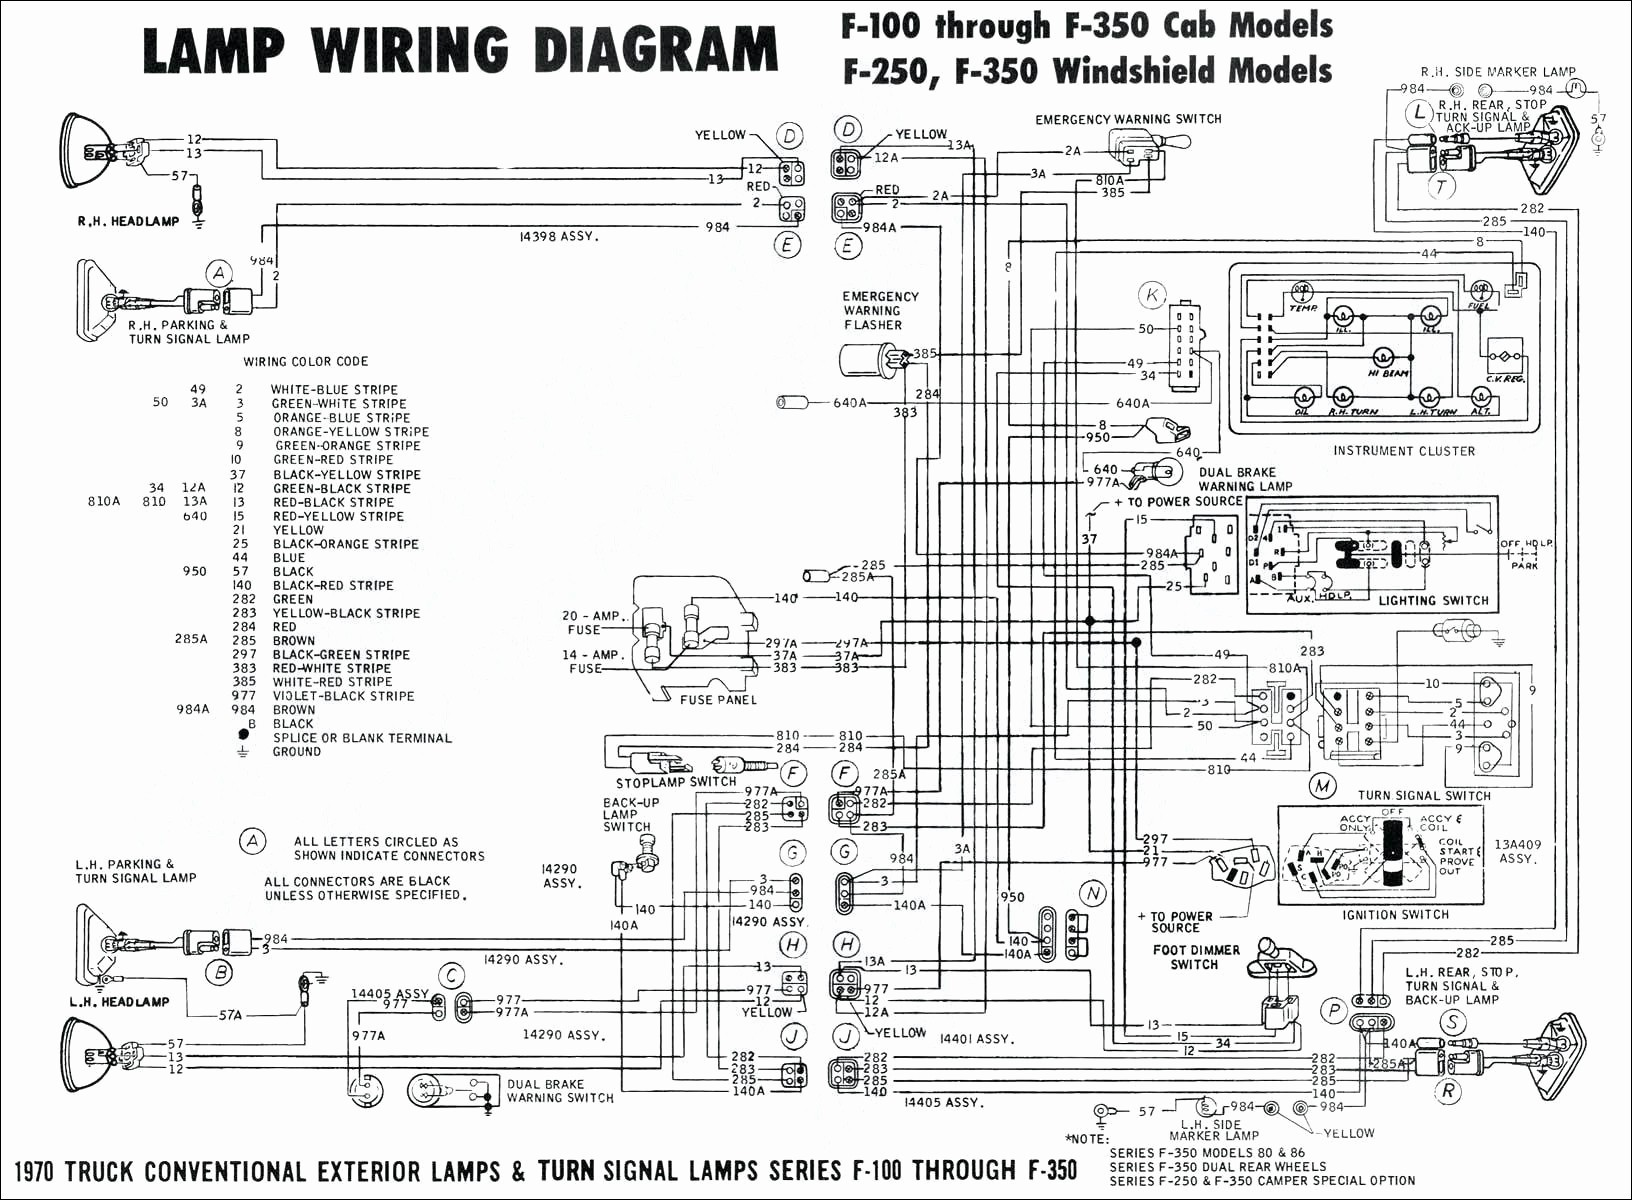 Kib Monitor Panel Diaghram Monitor Panel K21 Wiring Diagram Of Kib Monitor Panel Diaghram